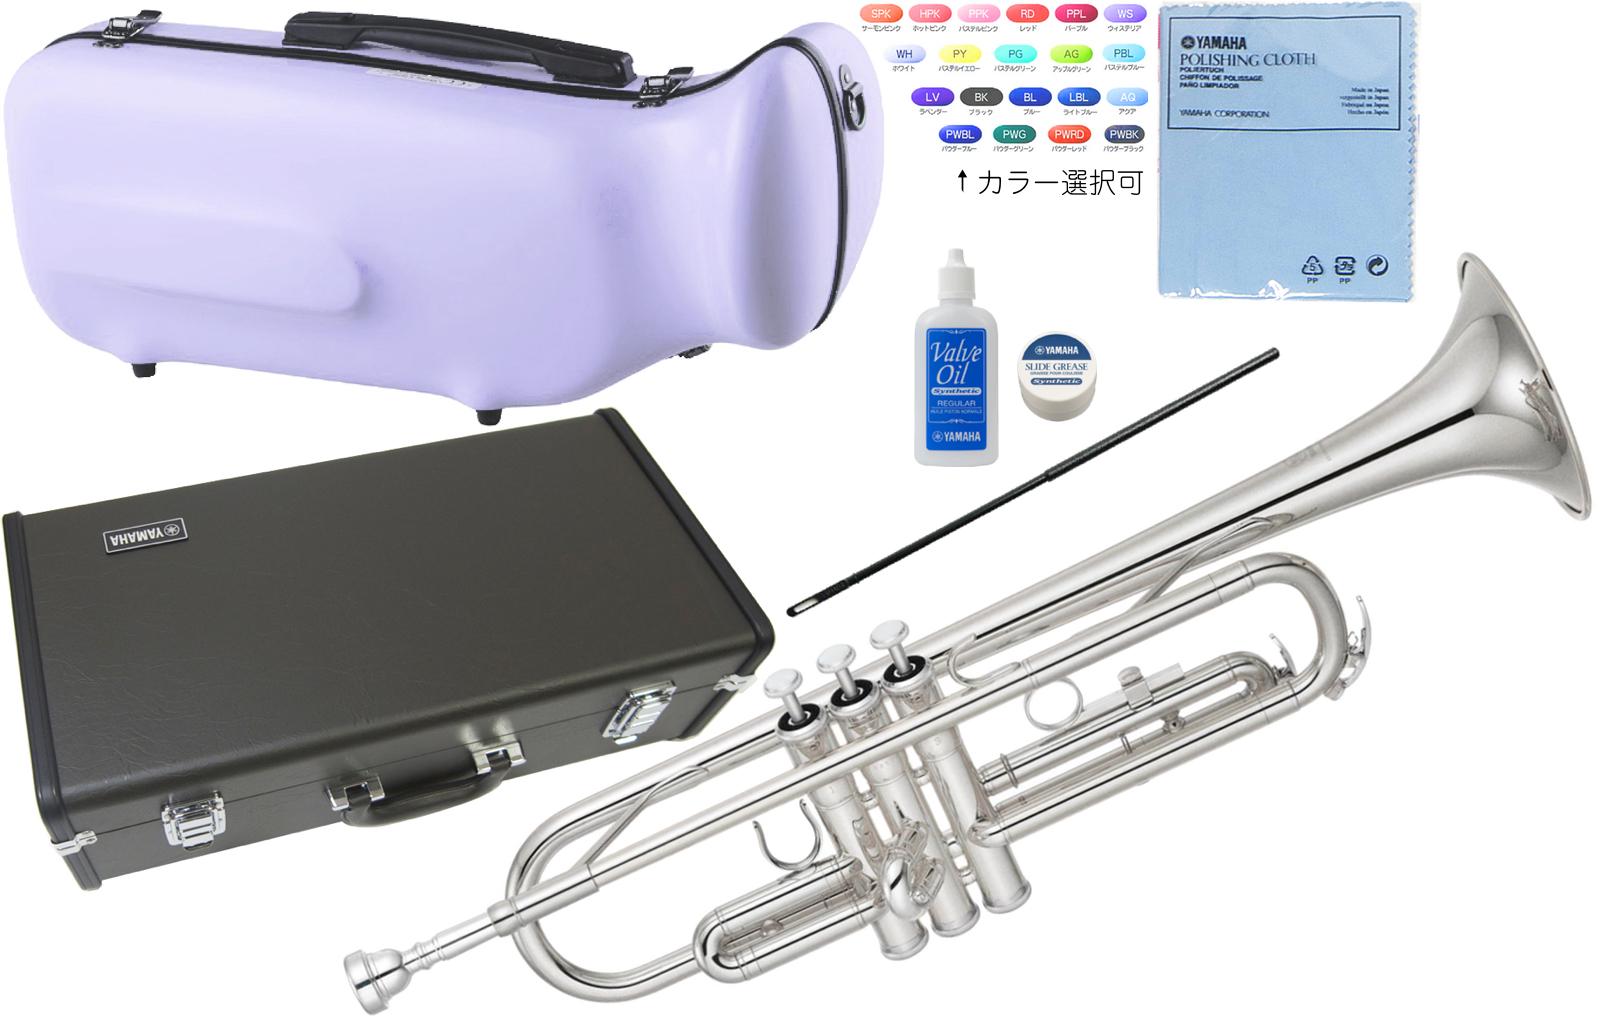 YAMAHA ( ヤマハ ) YTR-2330S トランペット 正規品 銀メッキ シルバー 管楽器 B♭Trumpet YTR-2330S-01 セット A 北海道 沖縄 離島不可